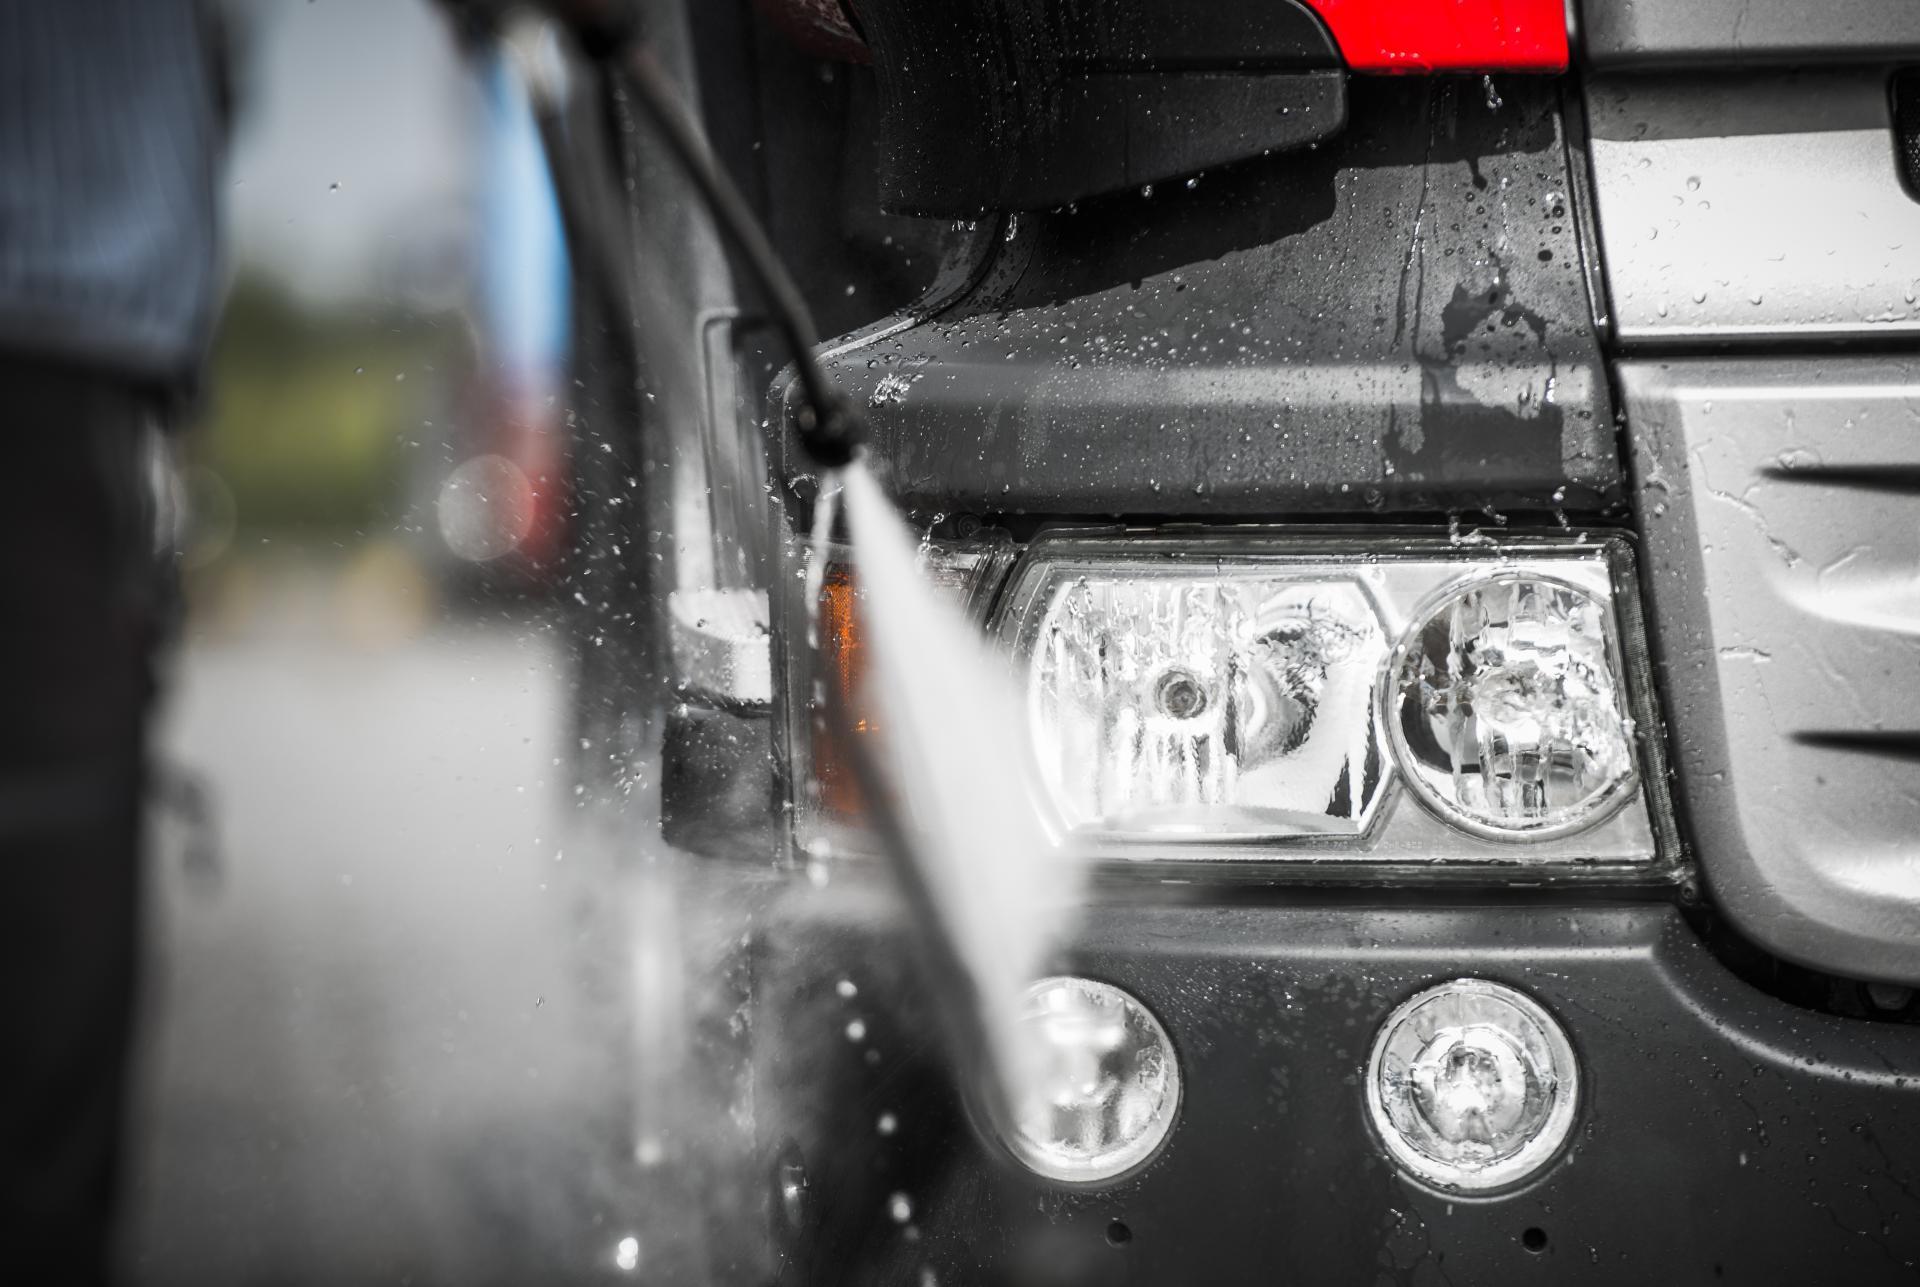 manual-truck-washing-PGHUR8A